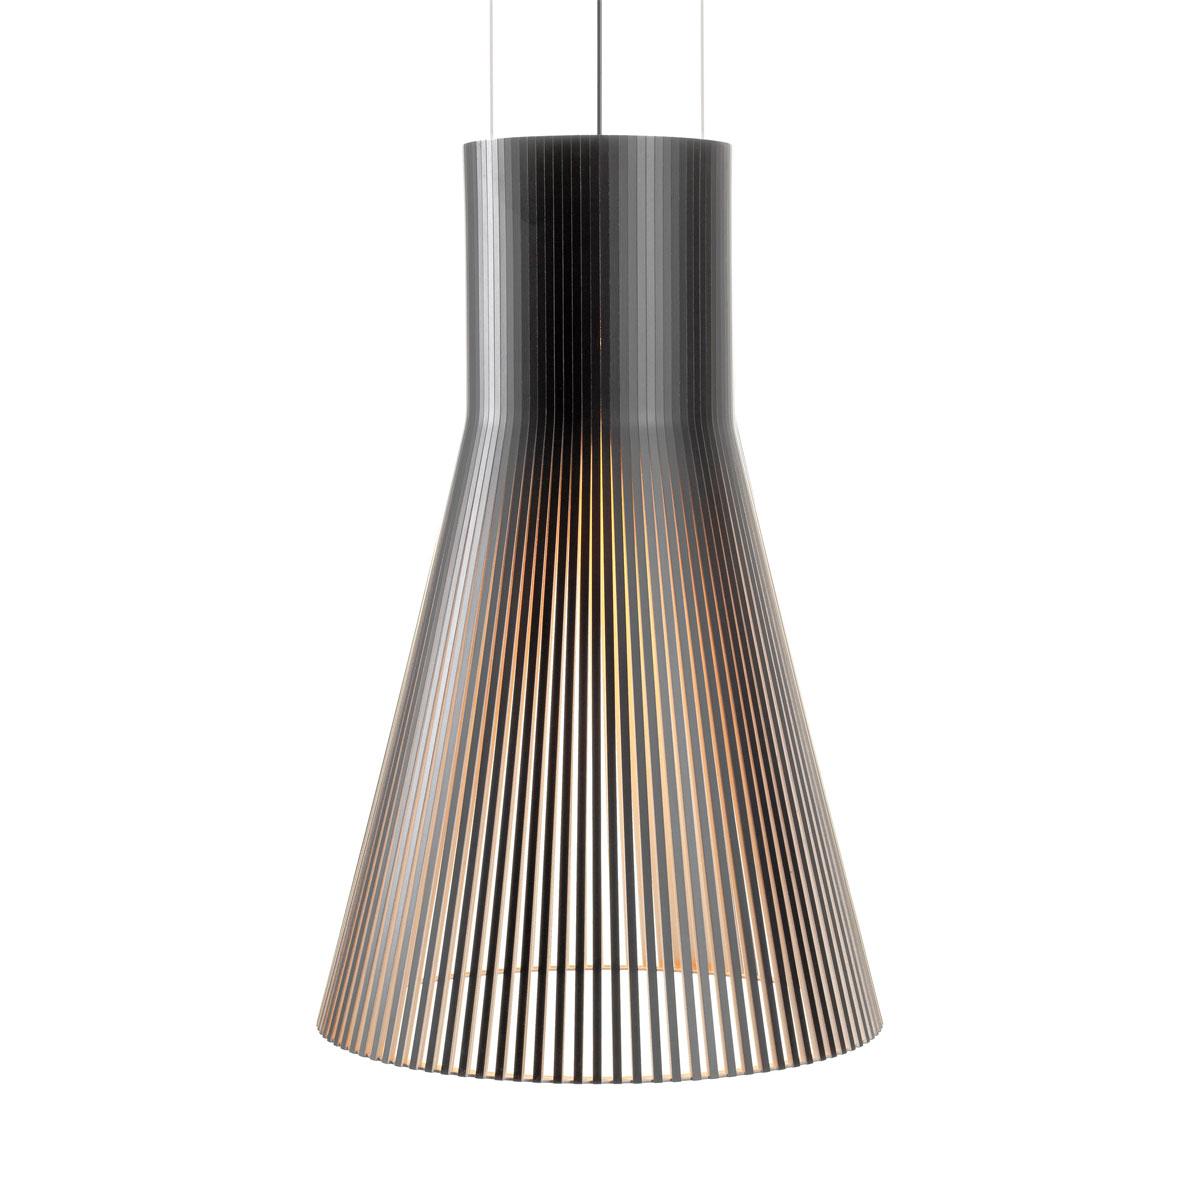 #8E673D22369056 Evolution Design Meubelen Lampen Secto Design Magnum 4202 3 betrouwbaar Design Meubelen Solden 1857 afbeelding opslaan 120012001857 Idee